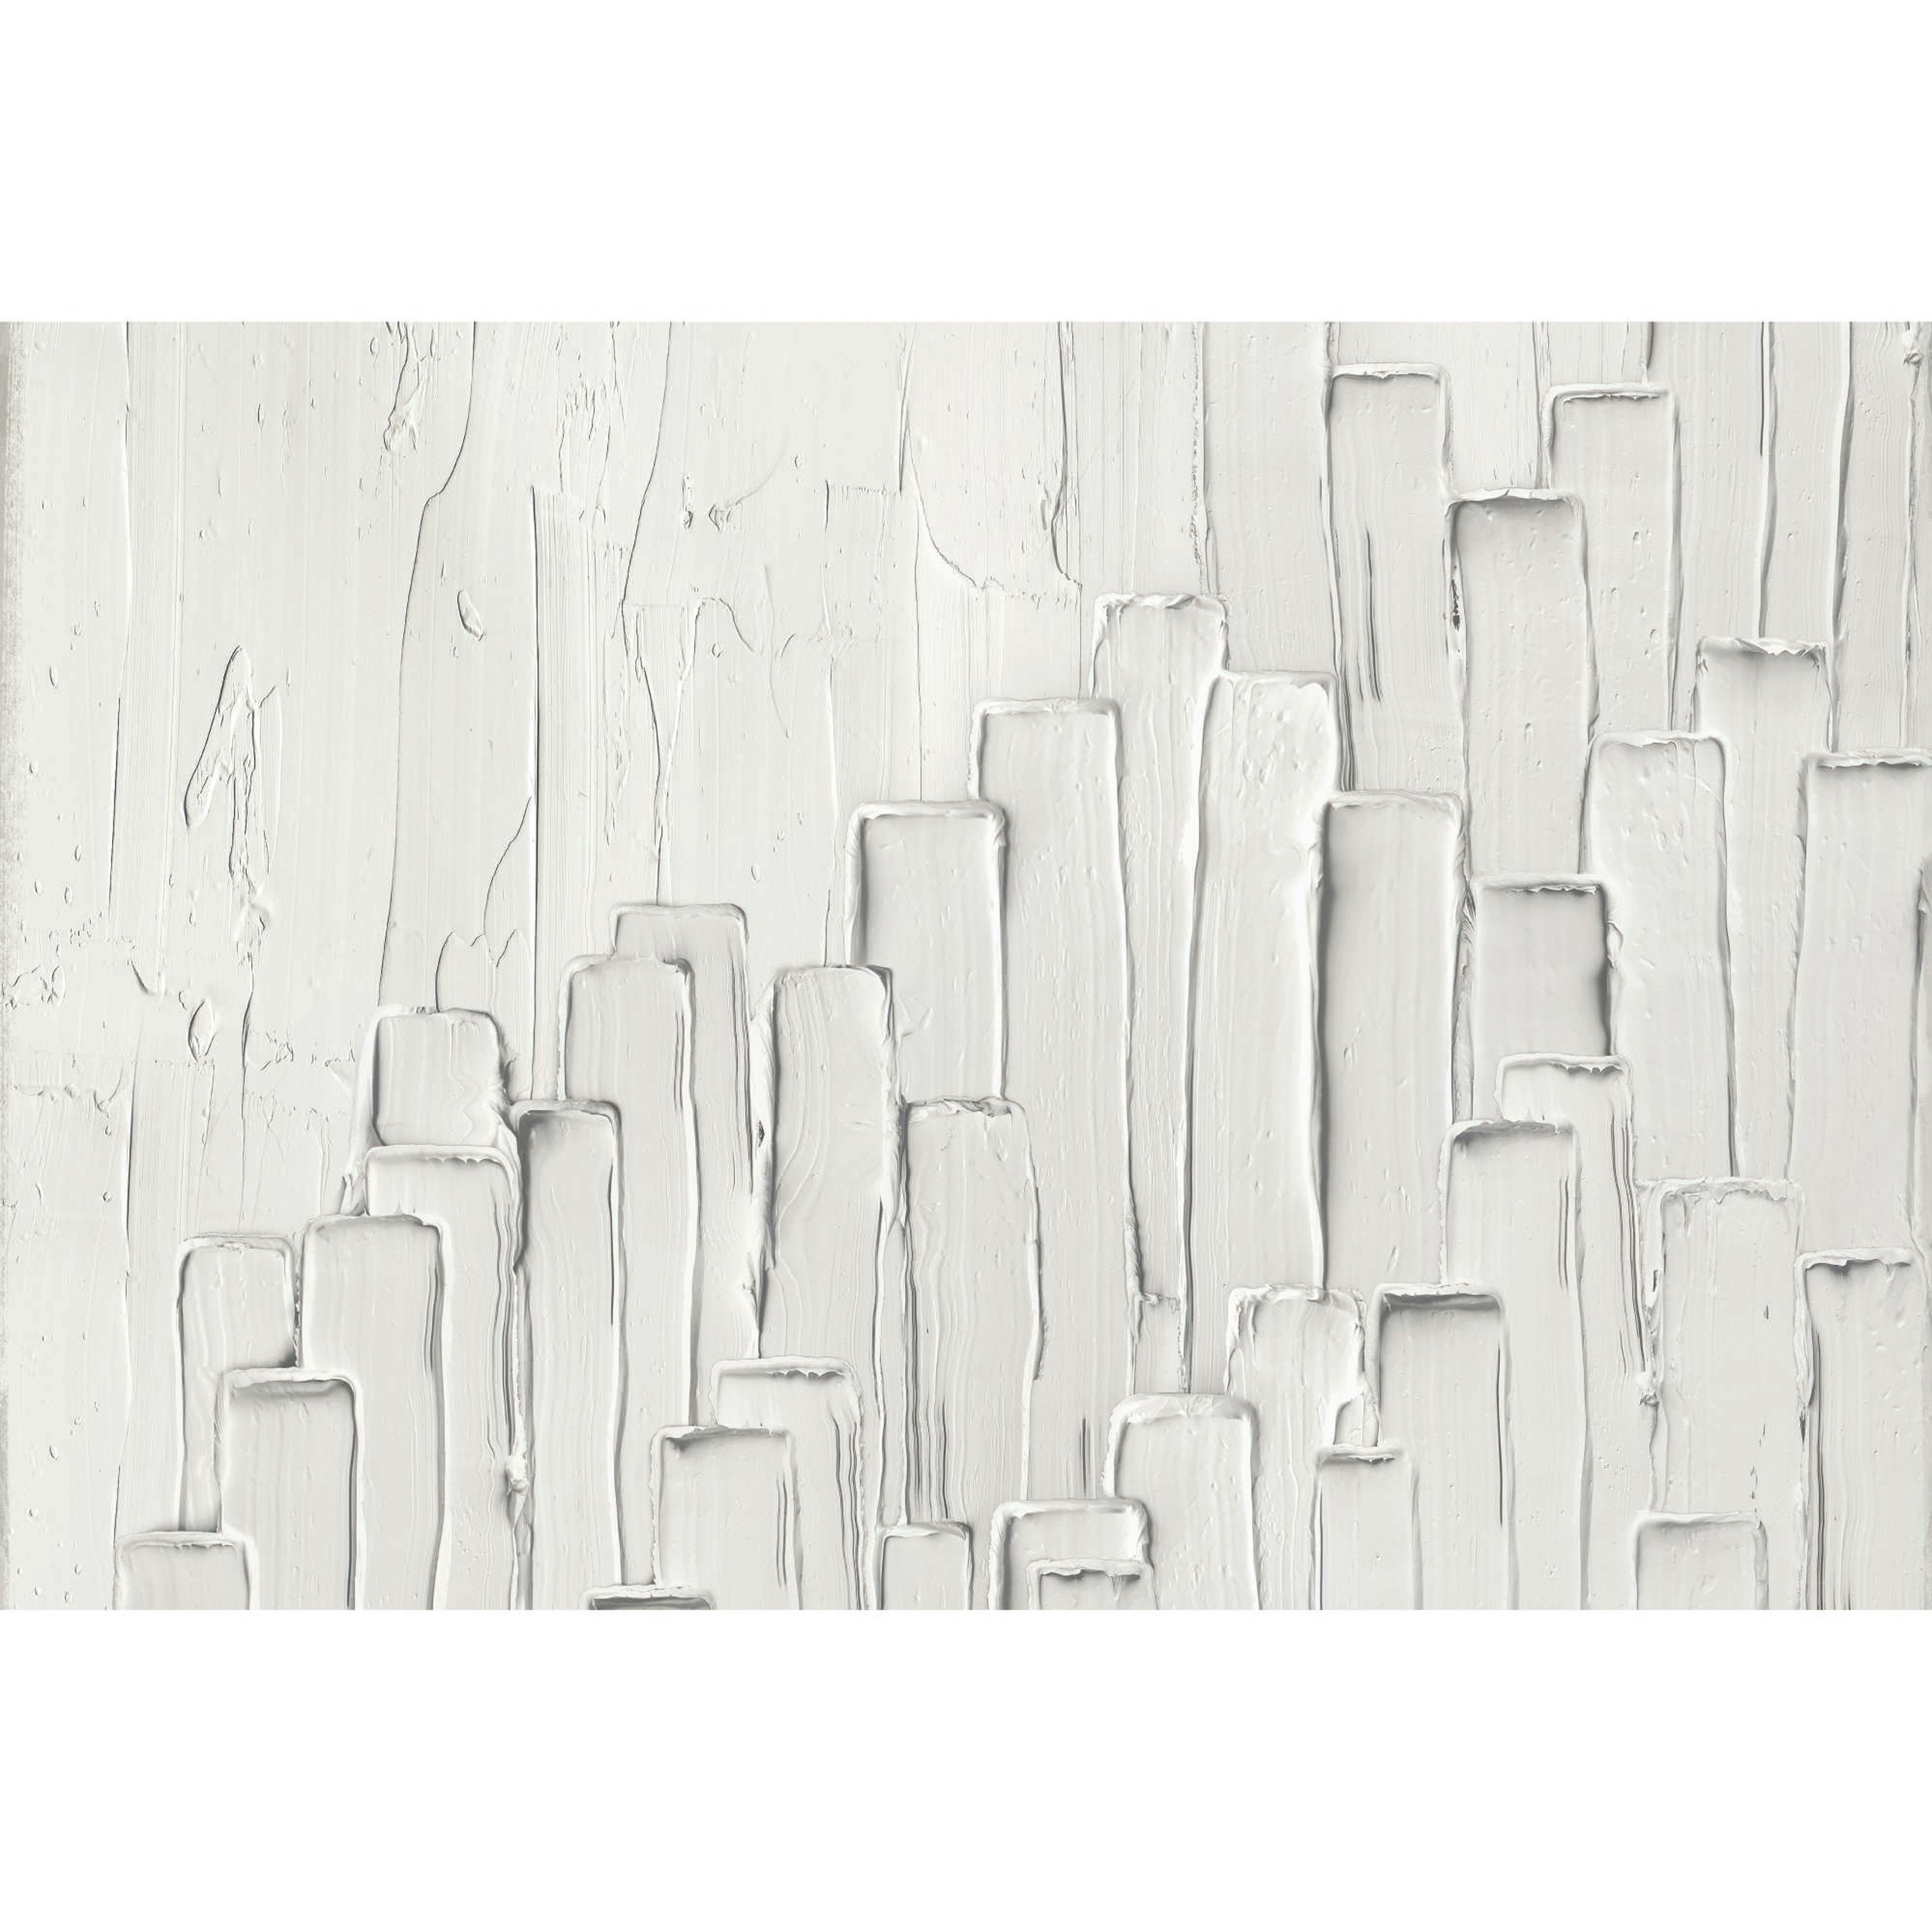 acheter tableau 90 x 60 cm effet peinture